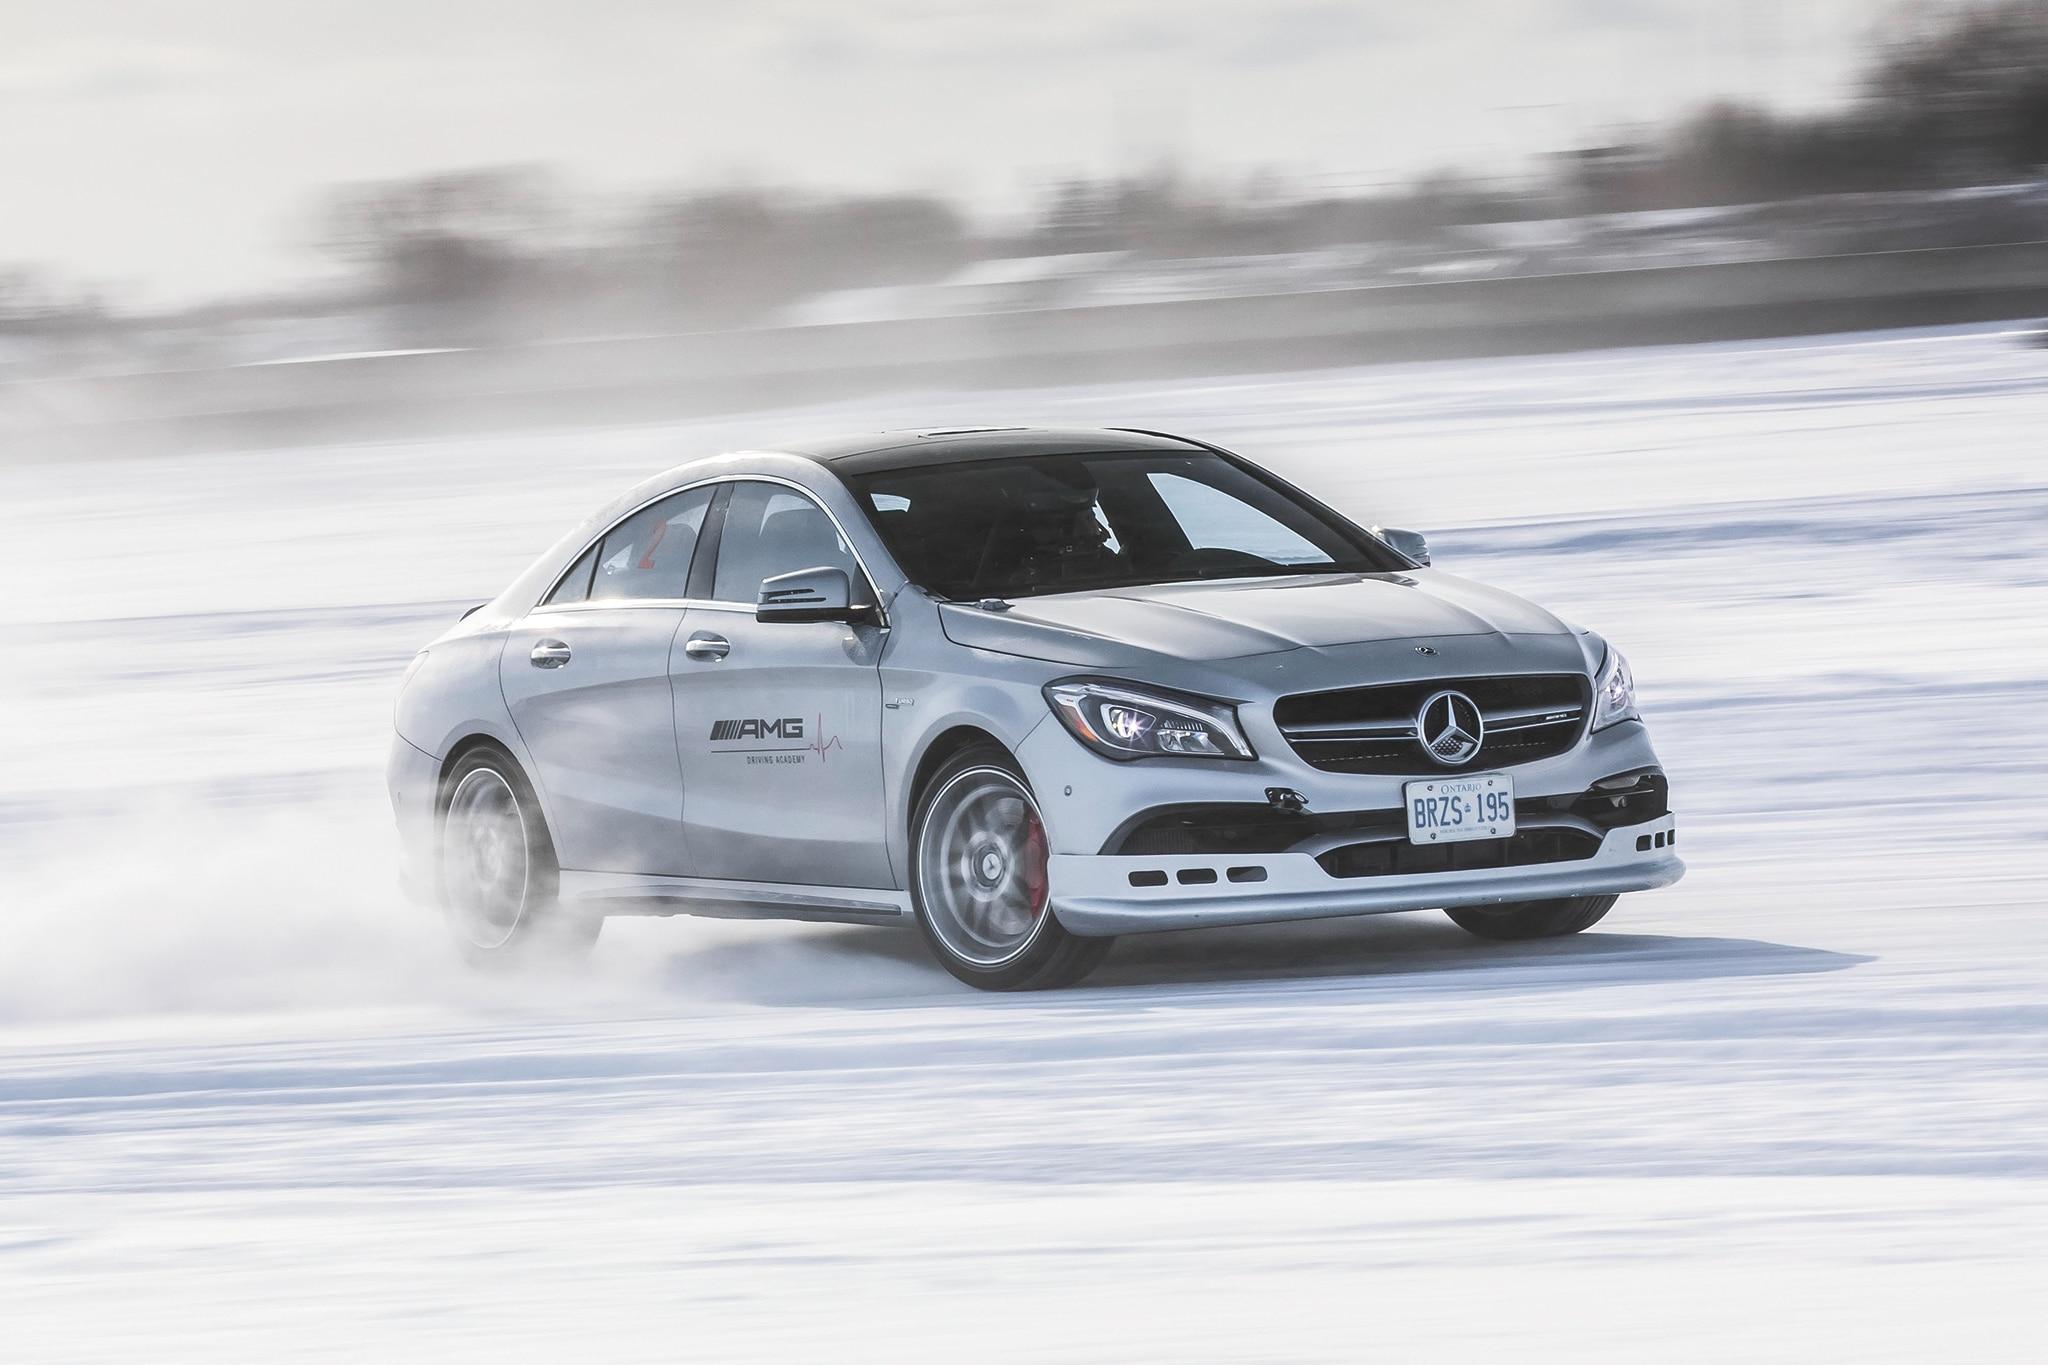 Mercedes AMG Winter Sporting Driving School 01